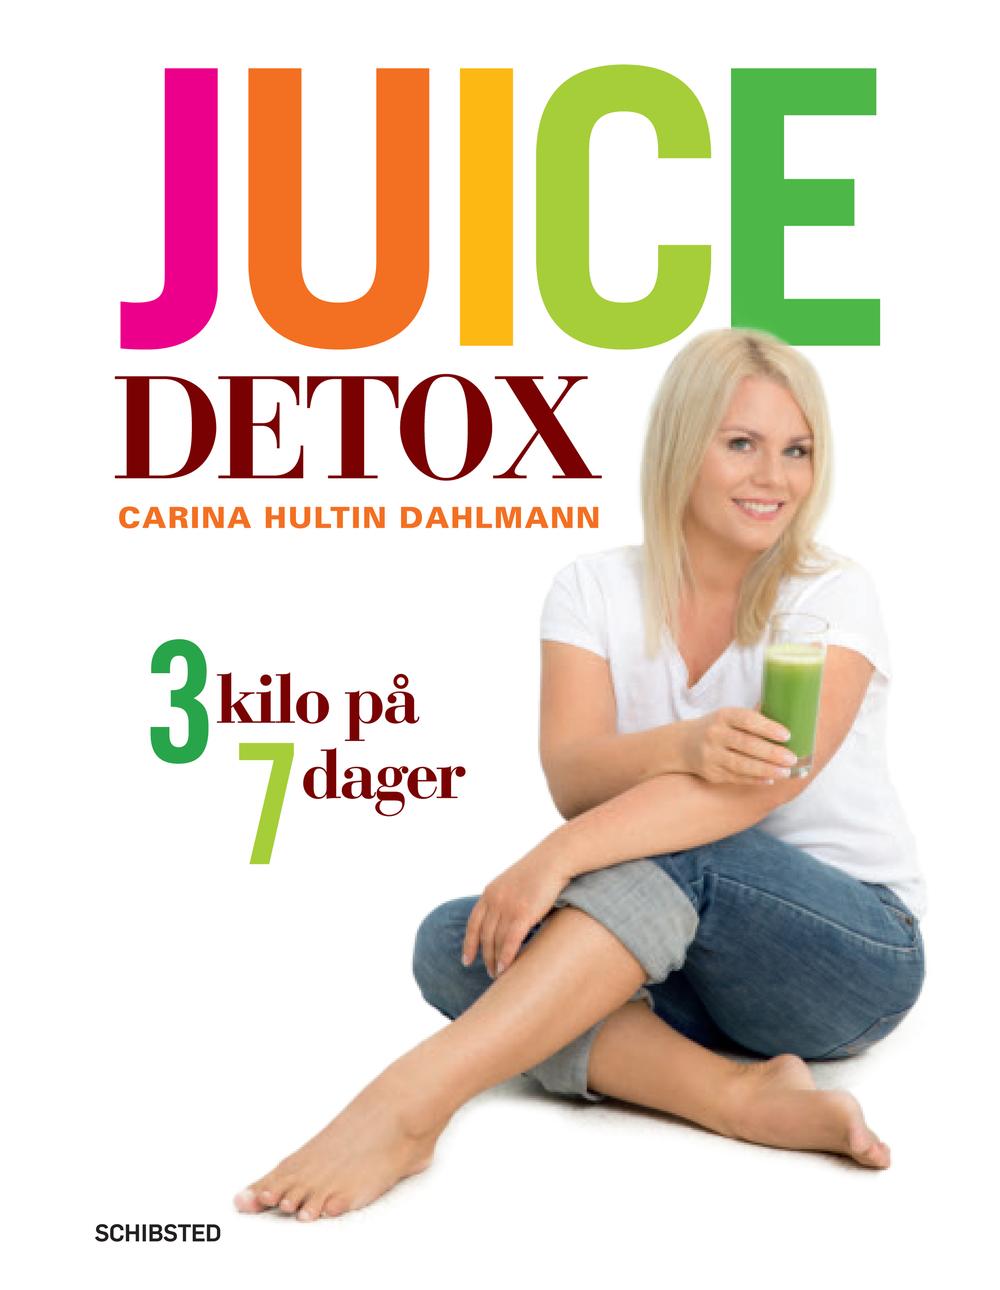 Juicy Detox,  3 kilo på 7 dager.